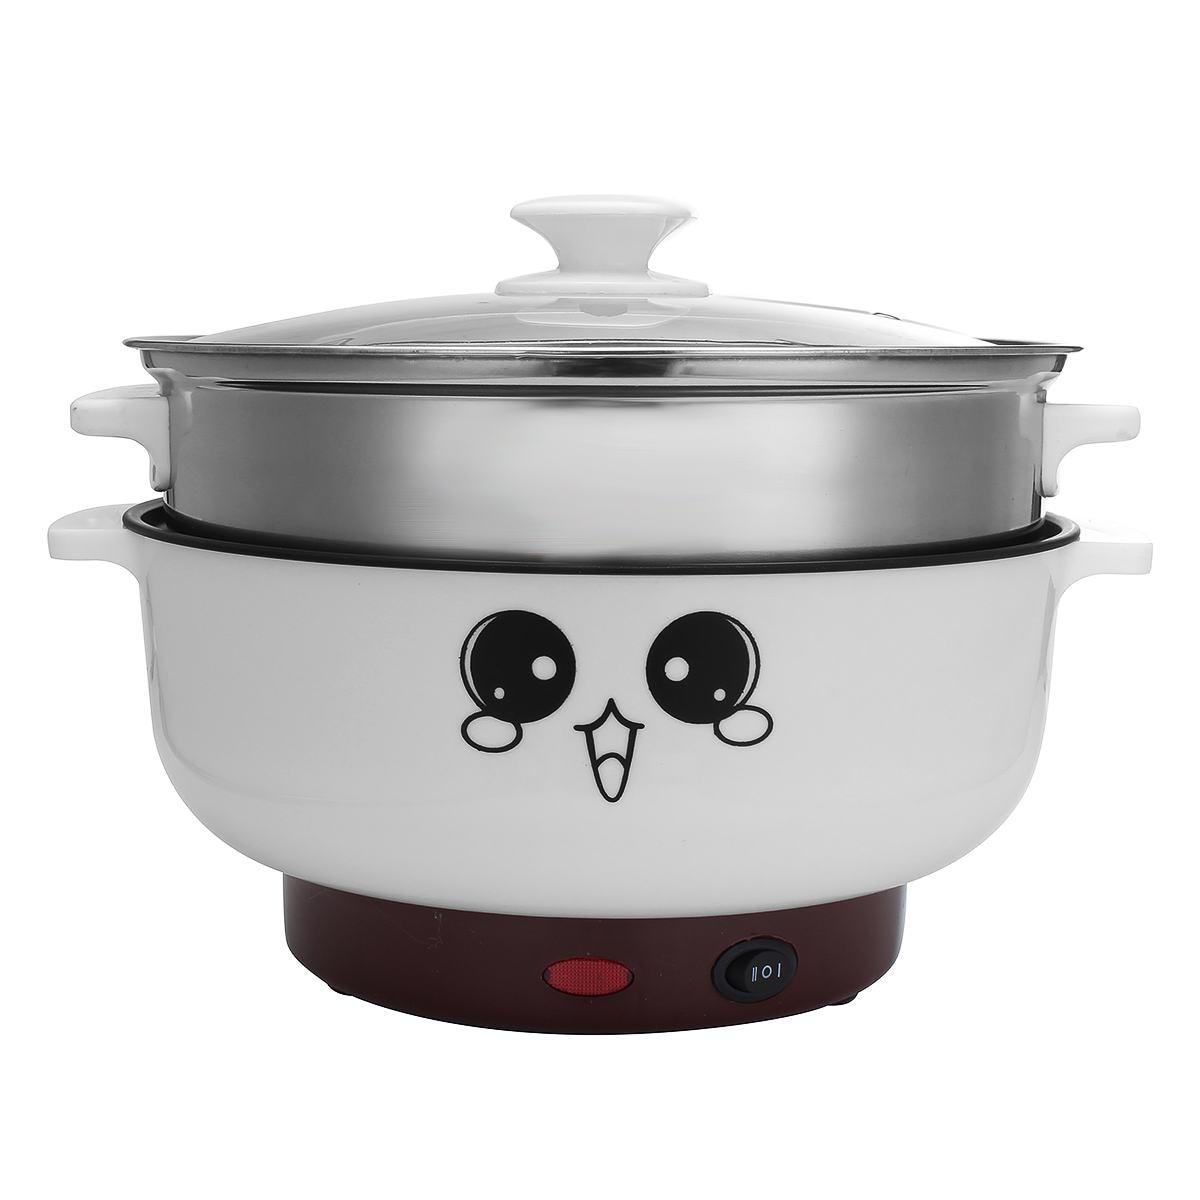 26cm 3.6L Electric Cooker Mini Hot Pot Boiler Multifunction Steamer Pot Dormitory Skillet Cookware Kitchen Cooking Appliance